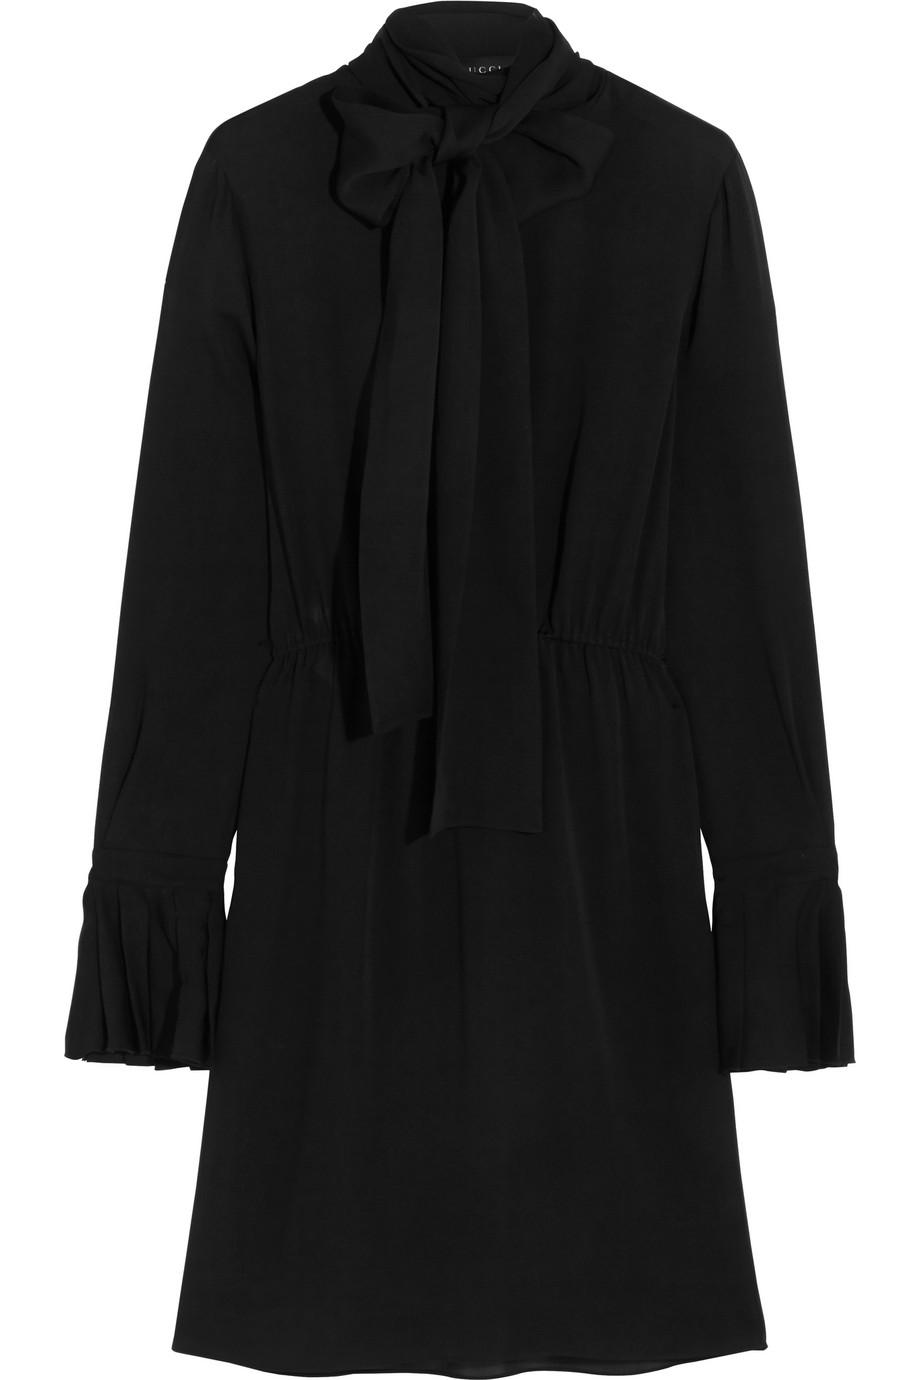 Gucci Pussy-Bow Silk-Georgette Dress, Black, Women's, Size: 36